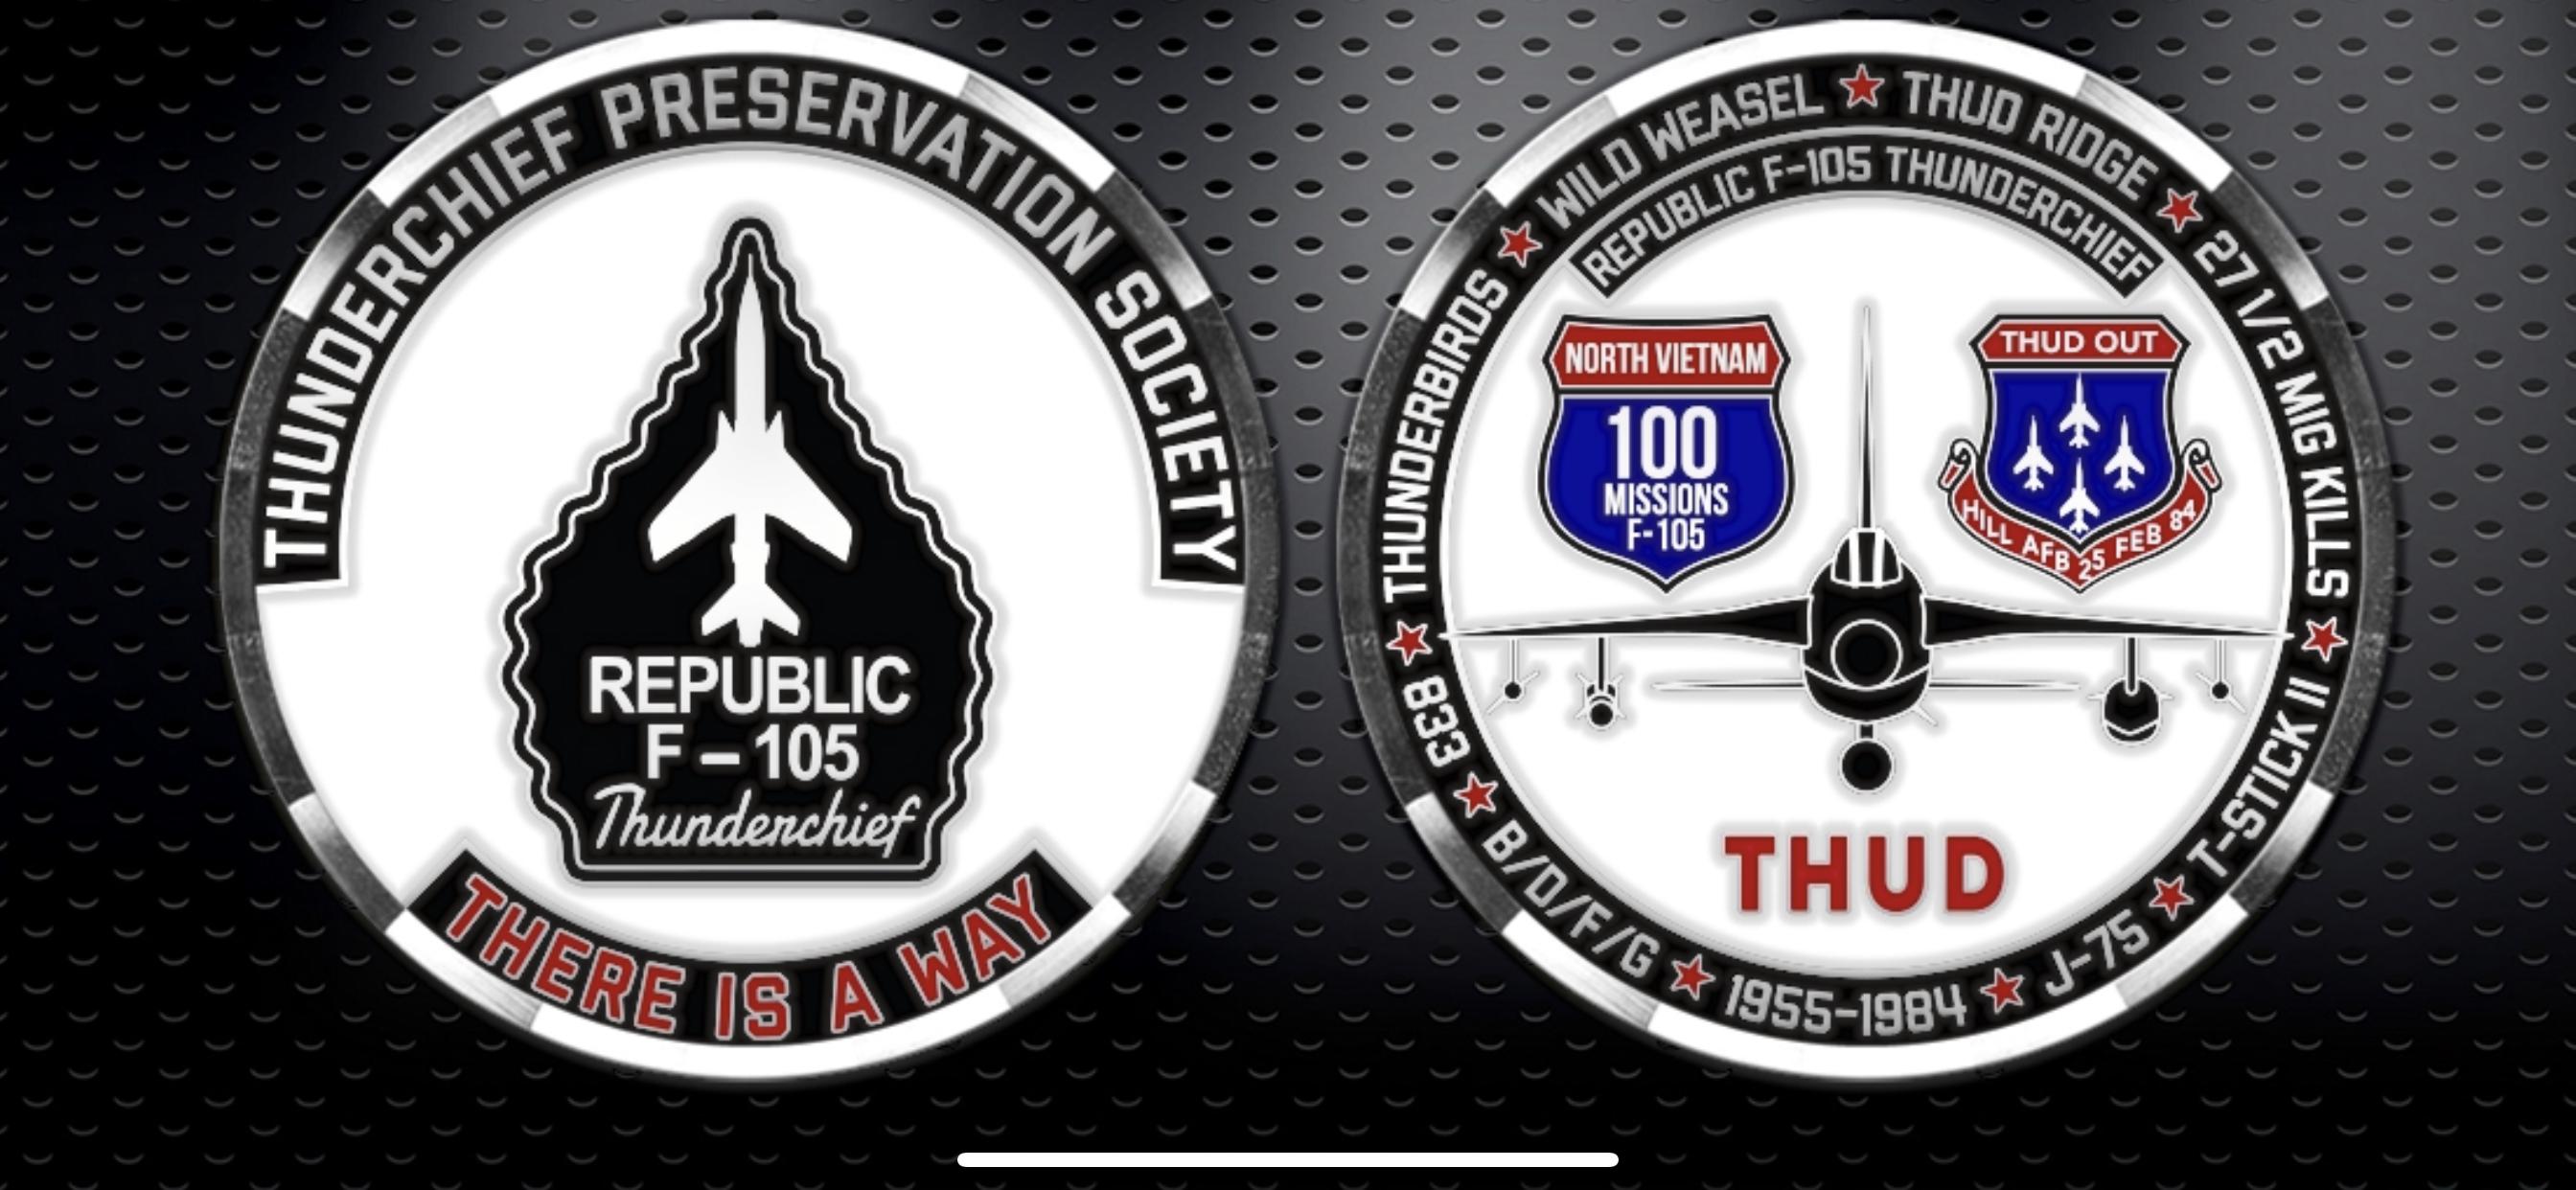 F-105 Thnuderchief